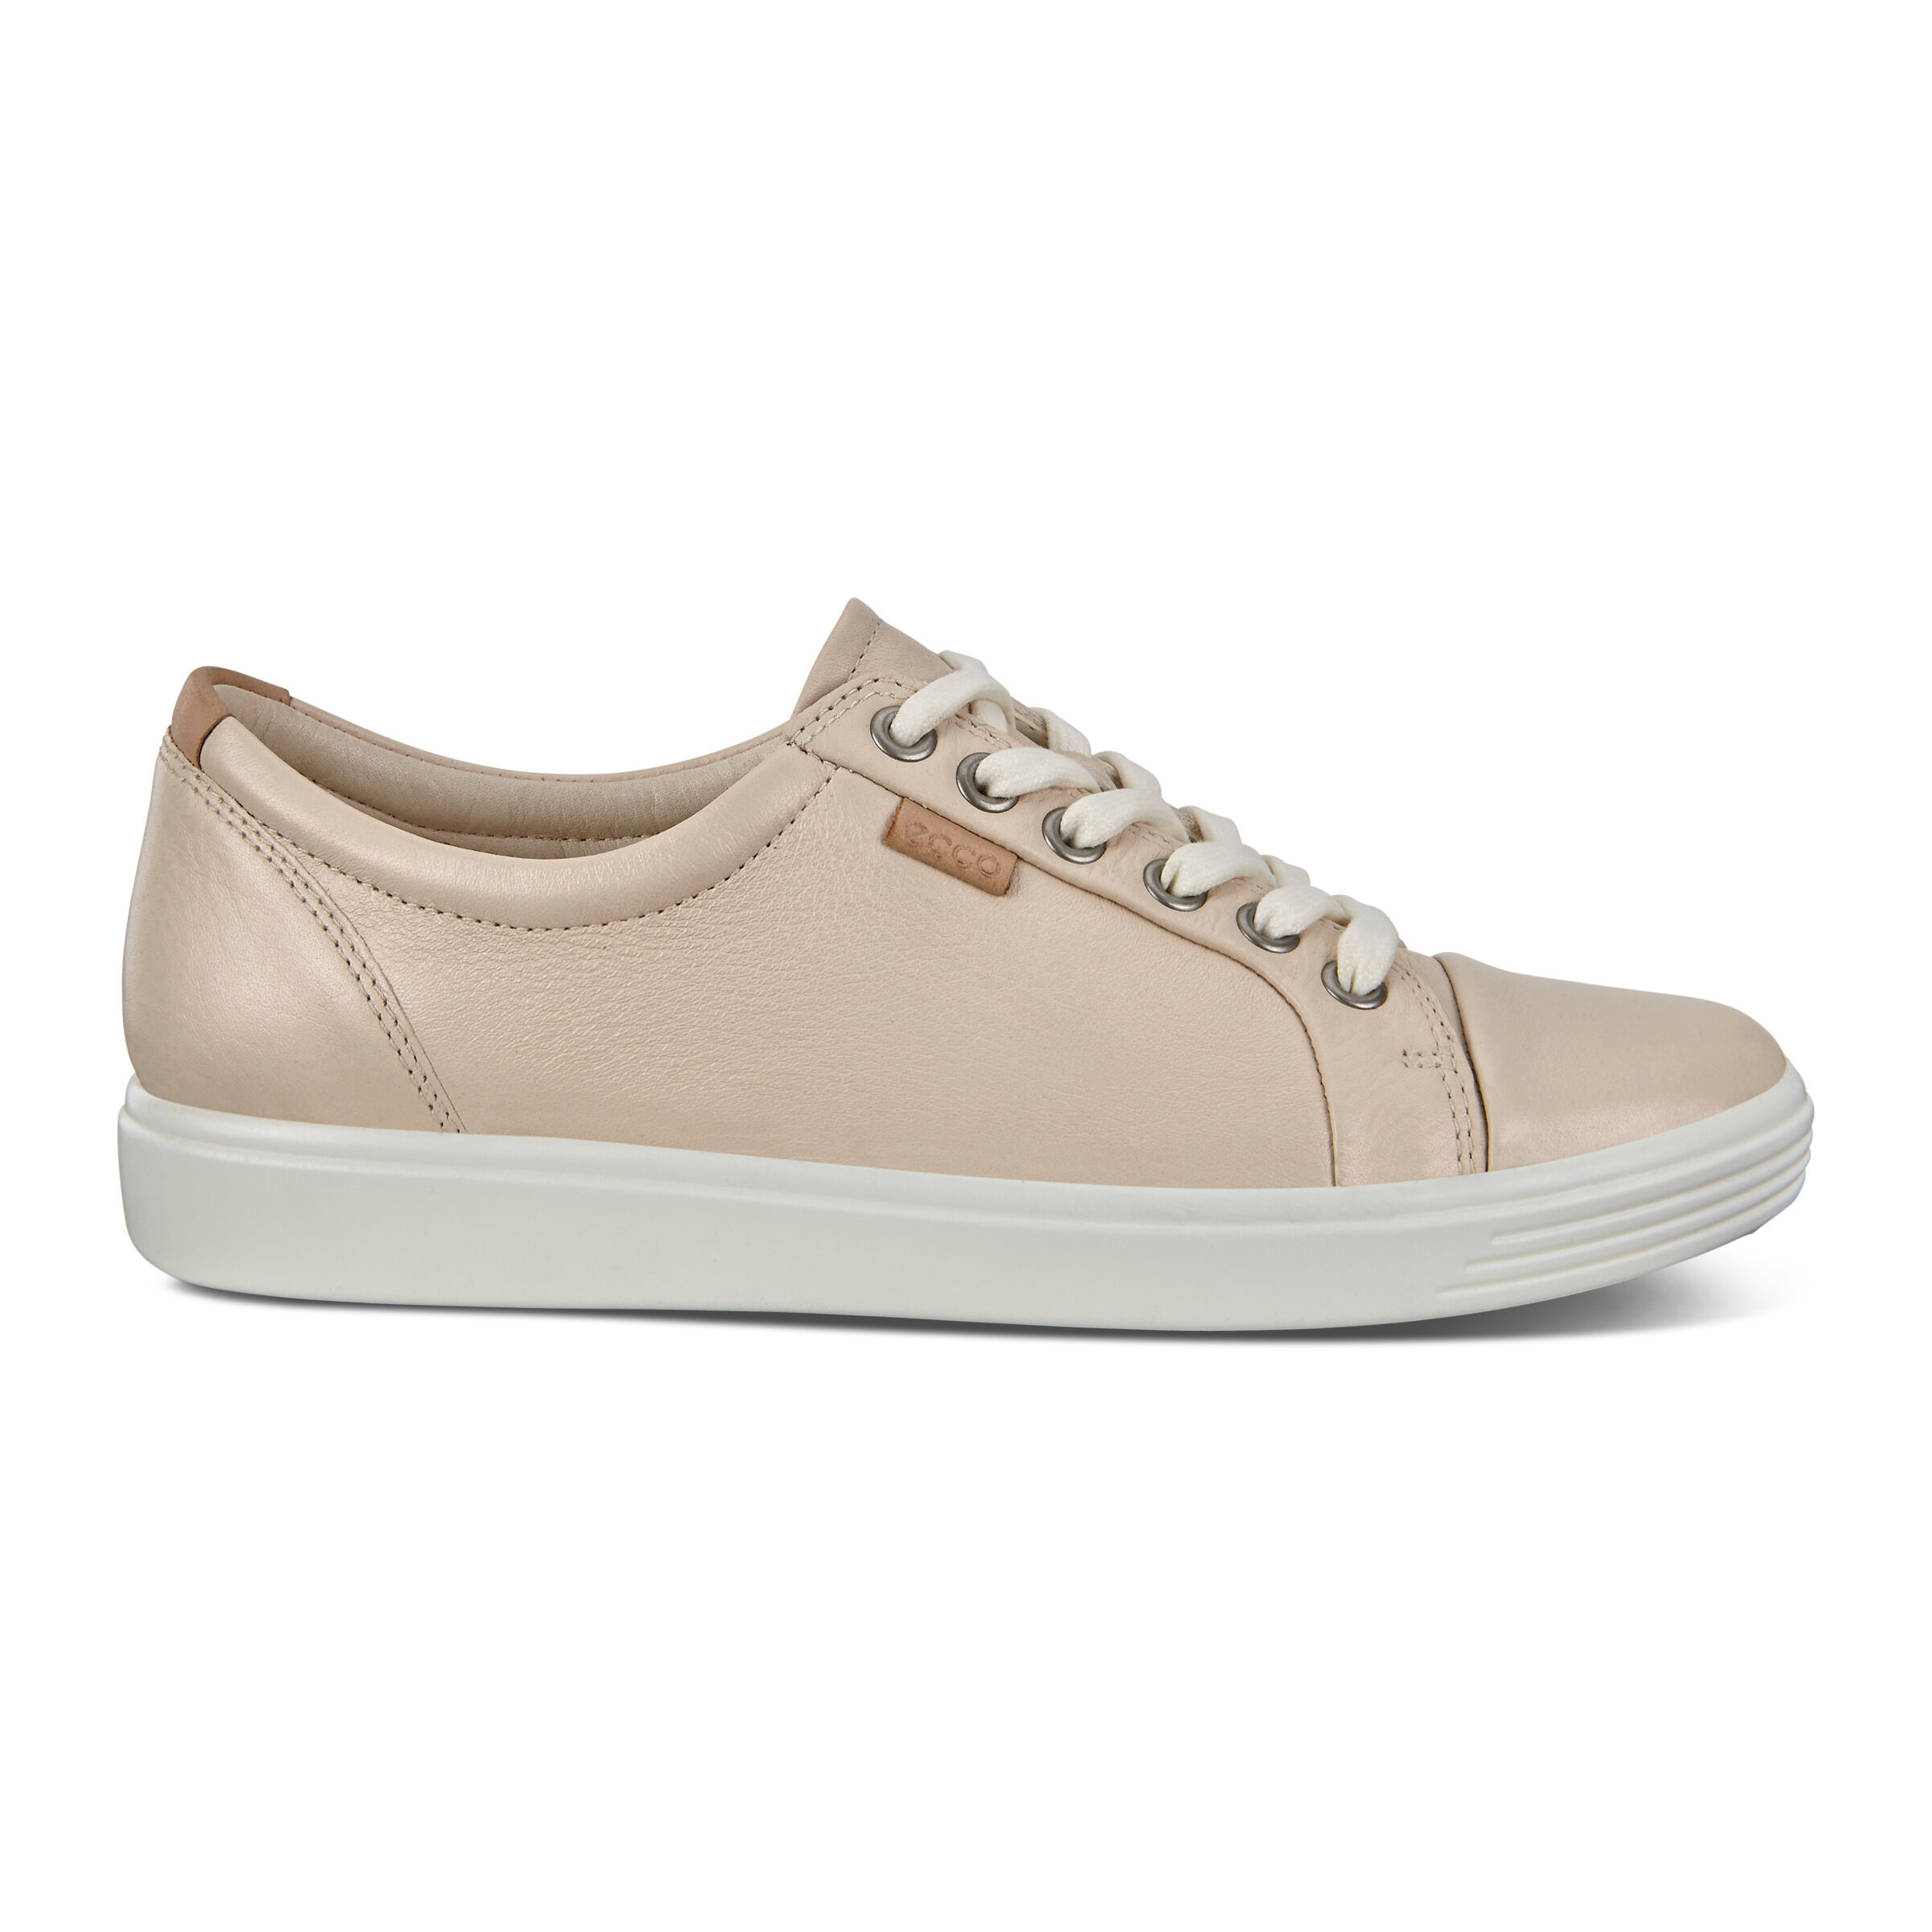 ecco footwear sale uk, Ecco golf shoes sale biom liteblack